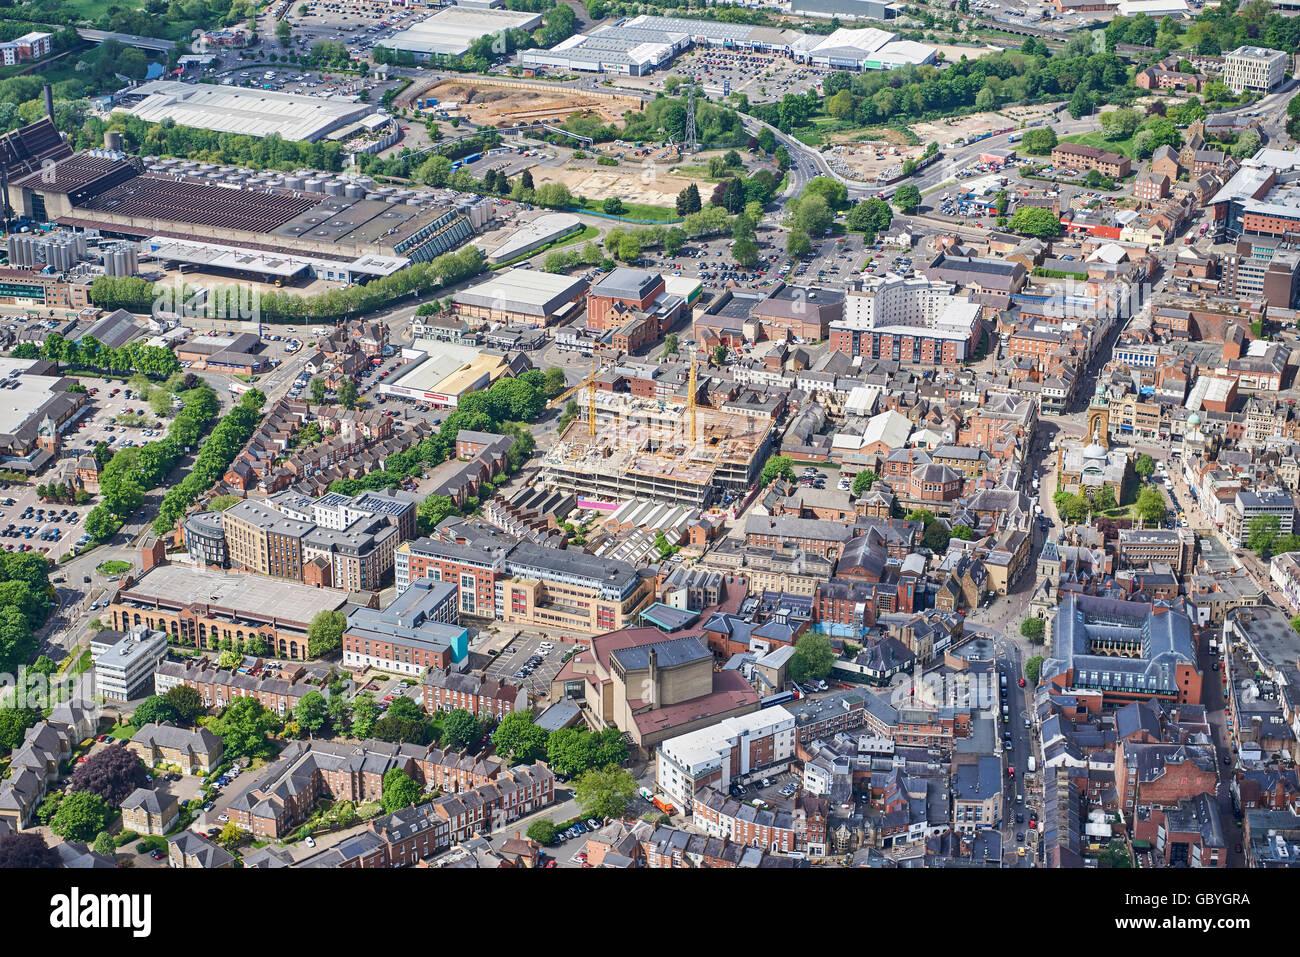 Northampton Town centre, Northamptonshire, UK - Stock Image